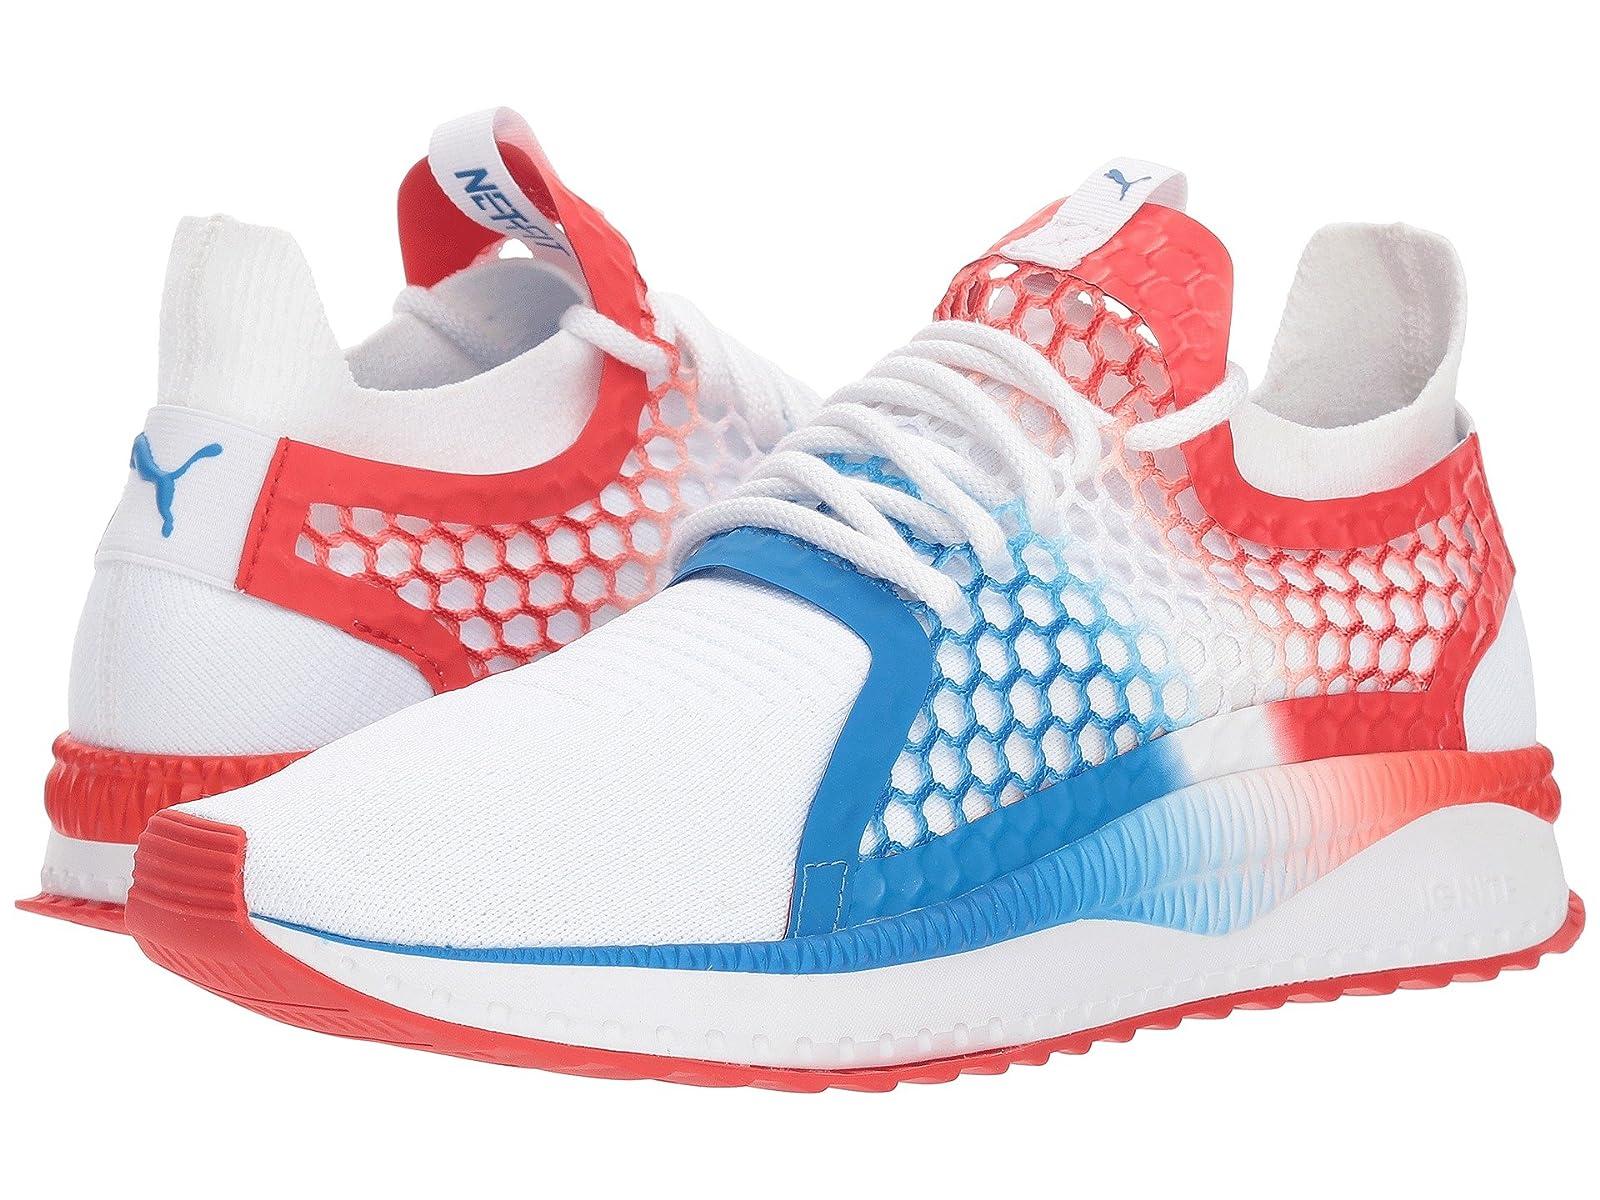 PUMA Tsugi Netfit V2 FirecrackerAtmospheric grades have affordable shoes